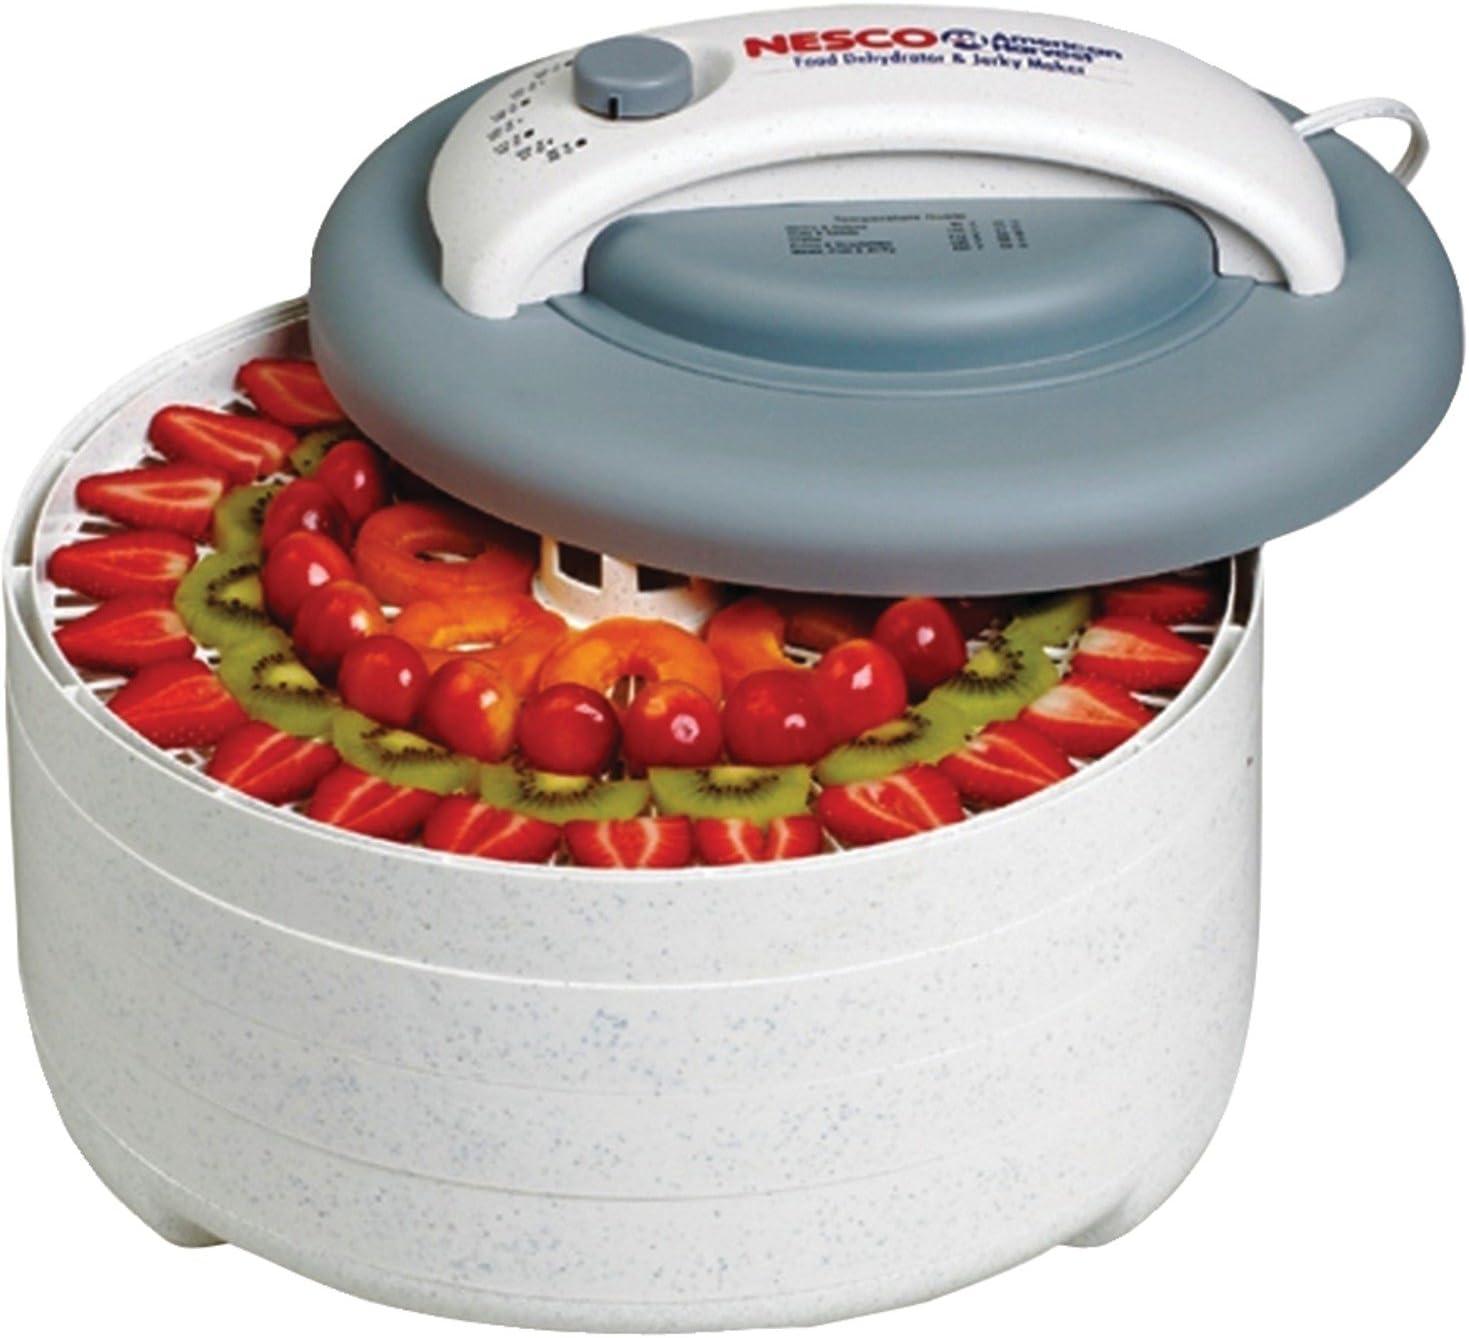 Nesco FD-61 Snackmaster Encore Four Tray Food Dehydrator